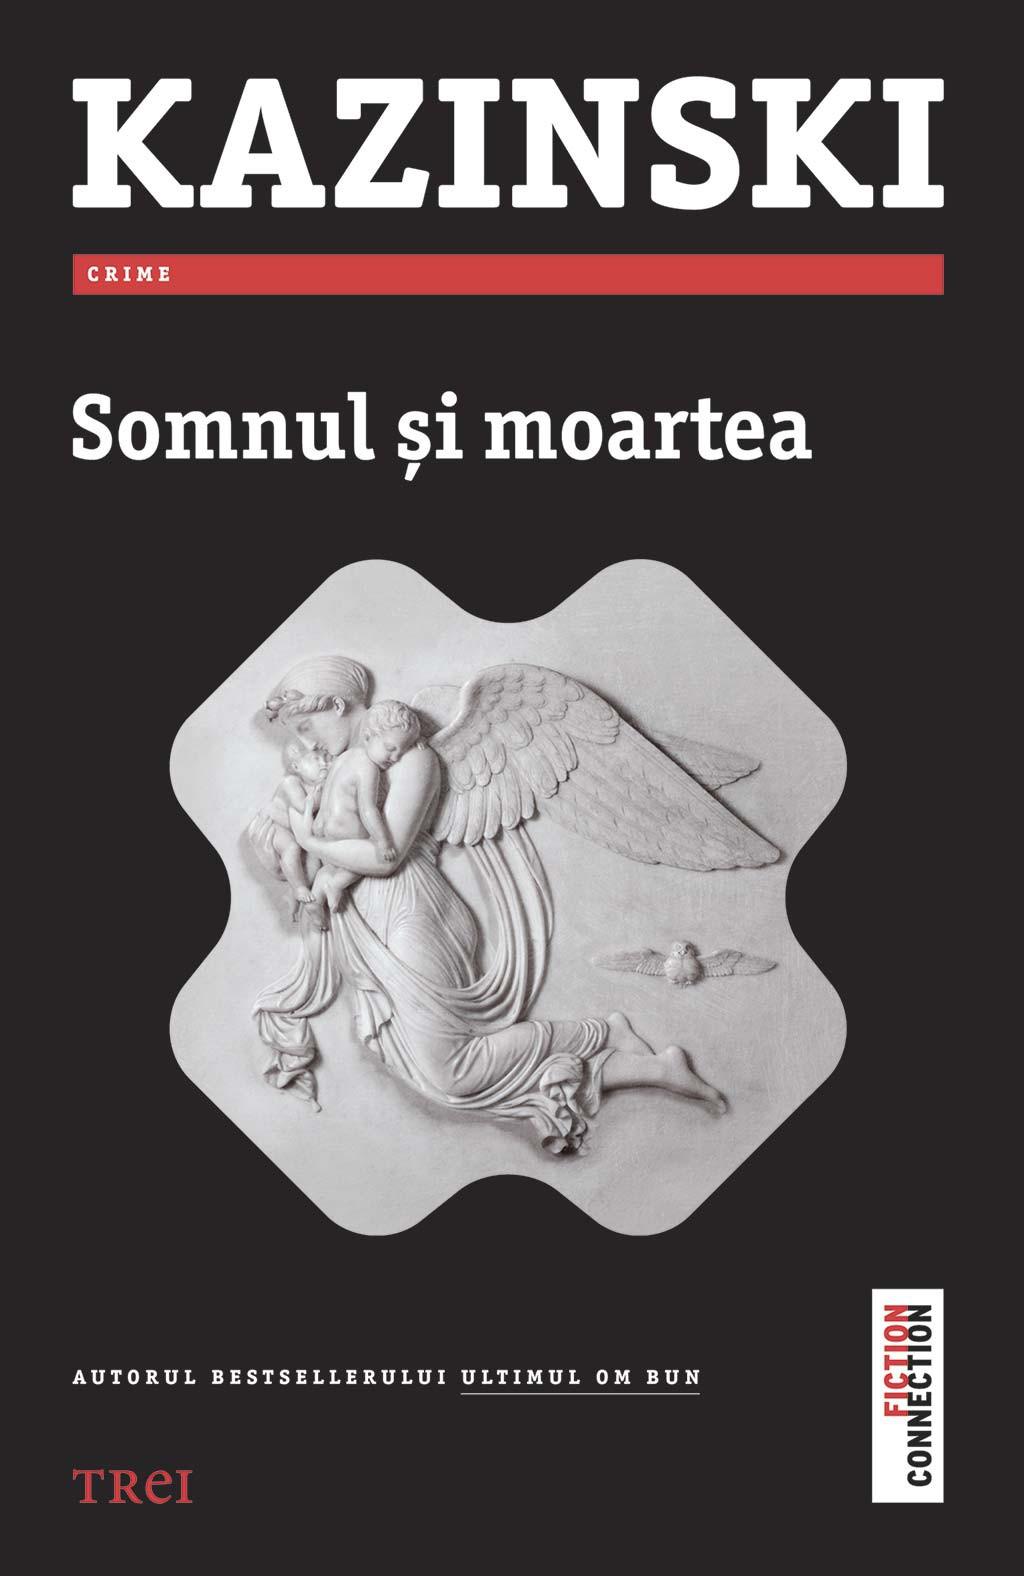 PDF ePUB Somnul si moartea de A.J. Kazinski (Download eBook)